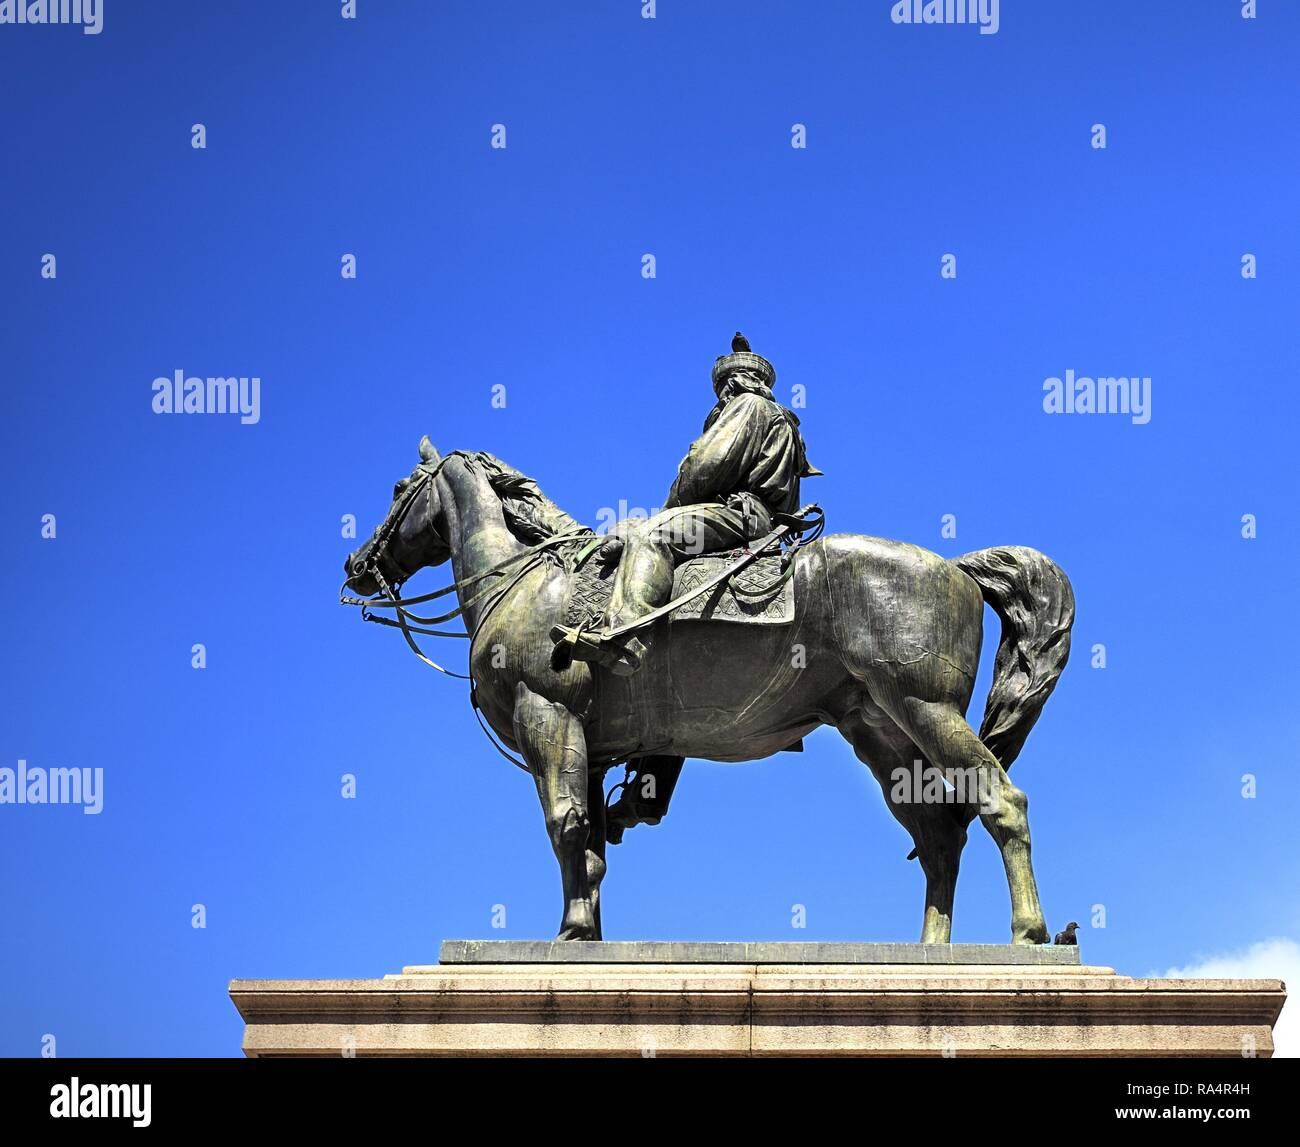 Wlochy - Liguria - Genua - plac Piazza de Ferrari - pomnik Giuseppe Garibaldi Italy - Liguria - Genoa -  Piazza de Ferrari square - Giuseppe Garibaldi monument - Stock Image